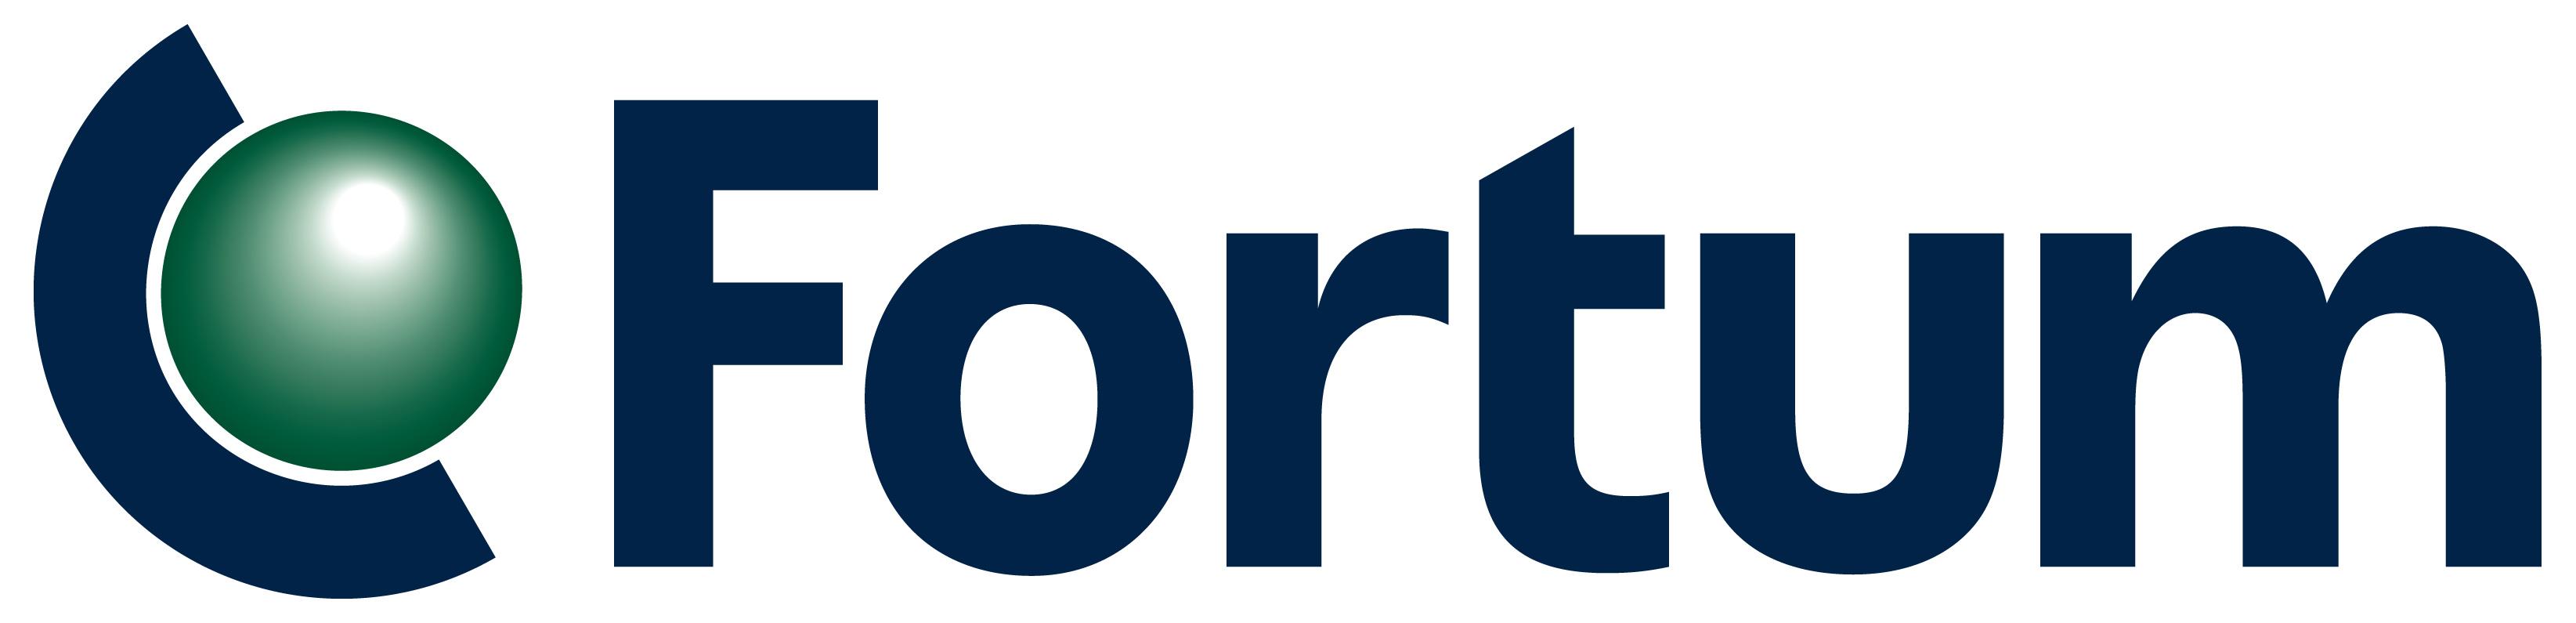 Fortum Logo Wallpaper